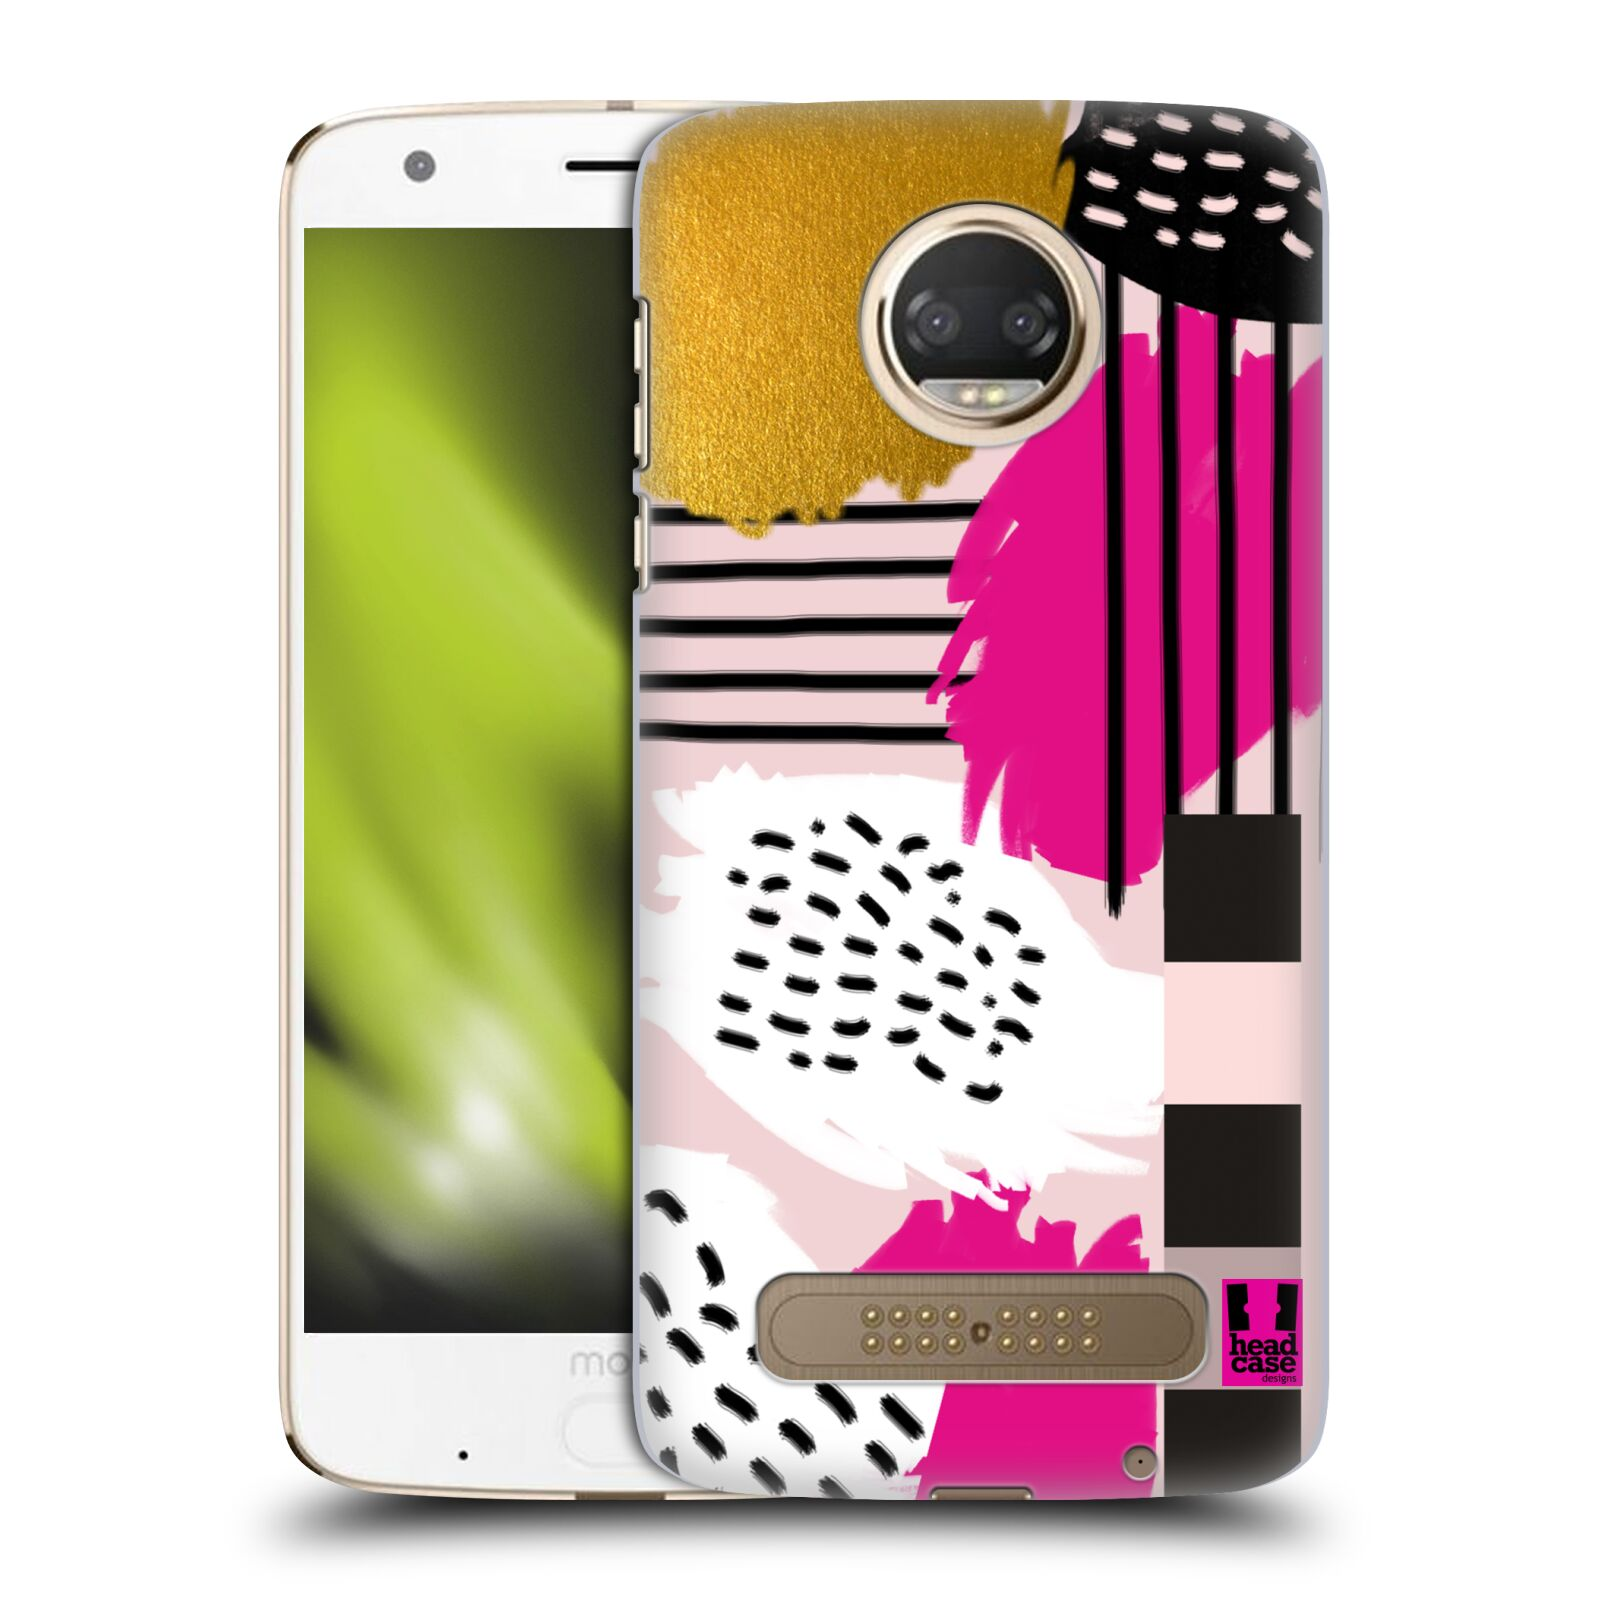 HEAD-CASE-DESIGNS-PINK-EMPIRE-HARD-BACK-CASE-FOR-MOTOROLA-PHONES-1